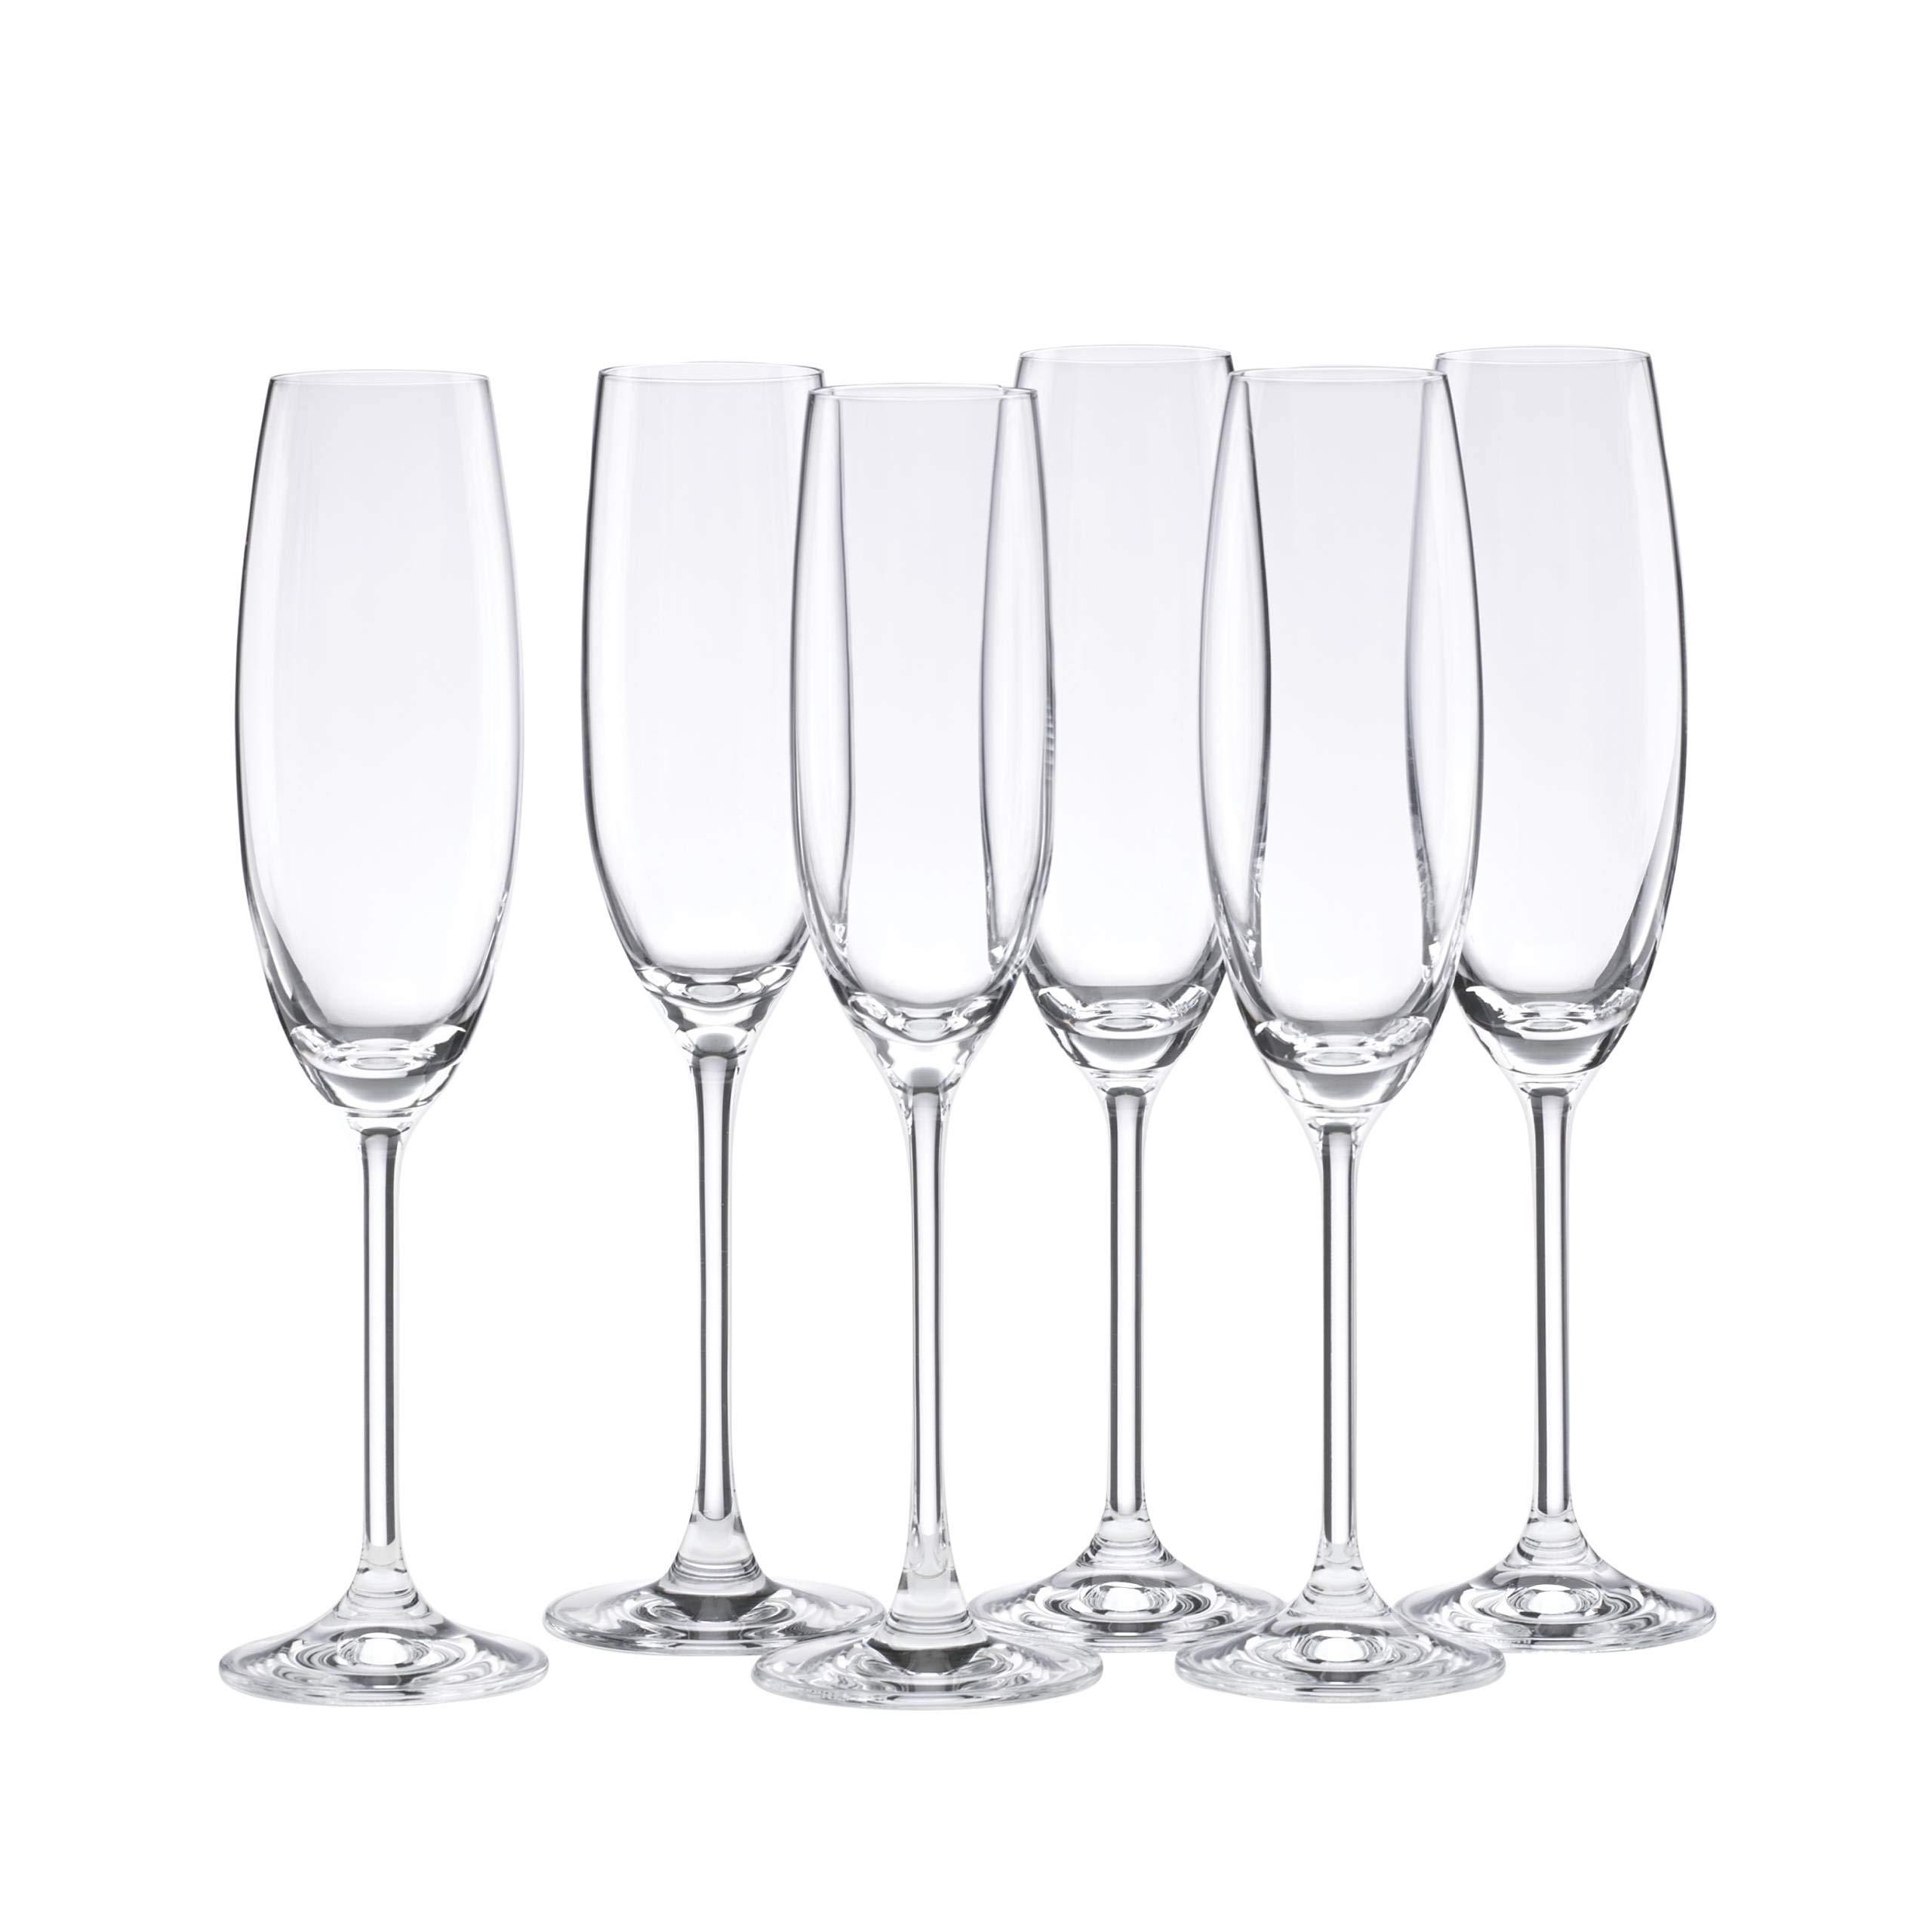 Lenox 845276 Tuscany Classics Champagne Flutes, Buy 4, Get 6 by Lenox